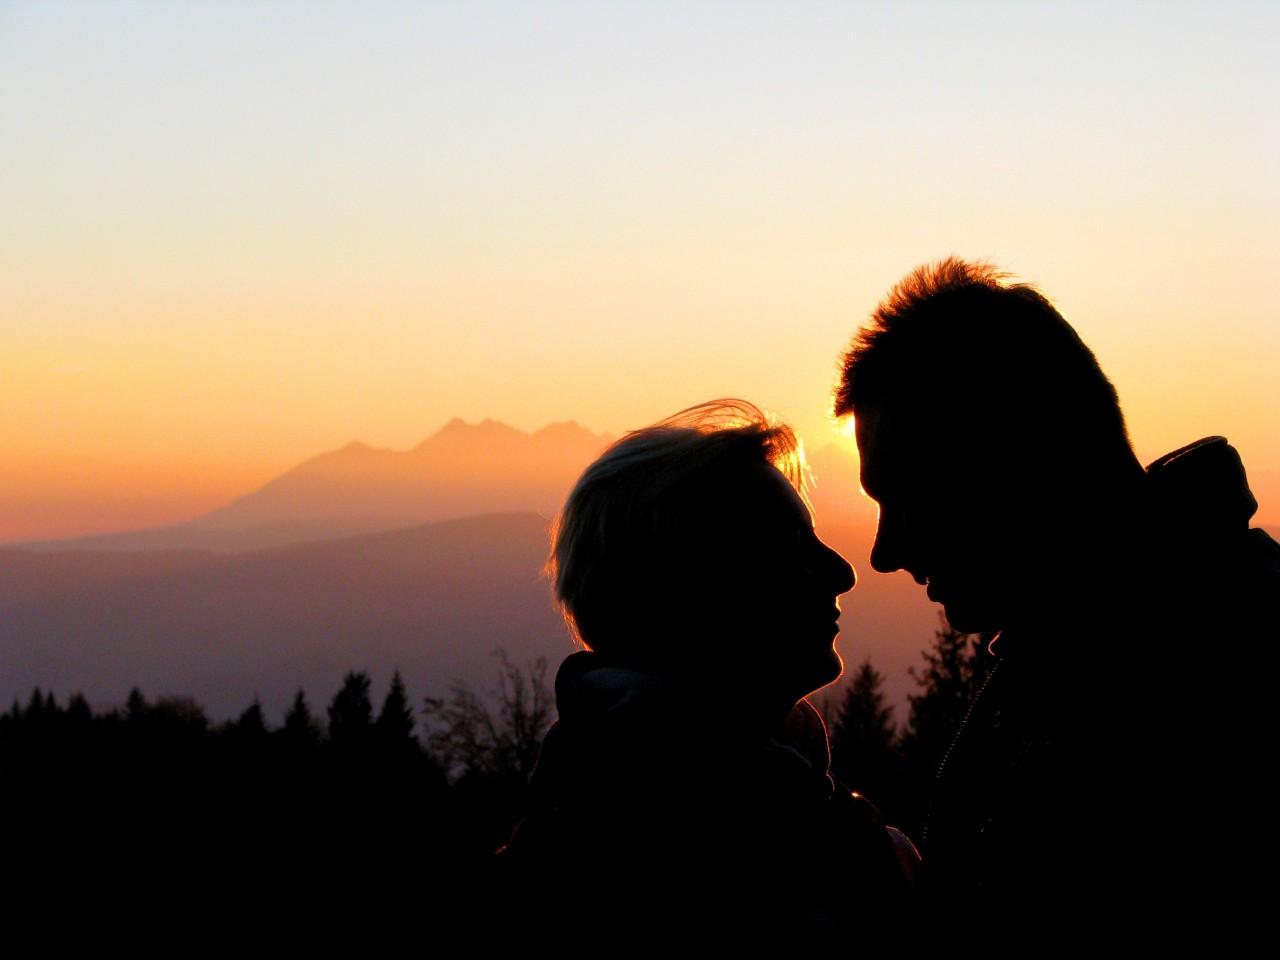 Florida Wedding Chapel – Eloping Is the New Lavish Wedding